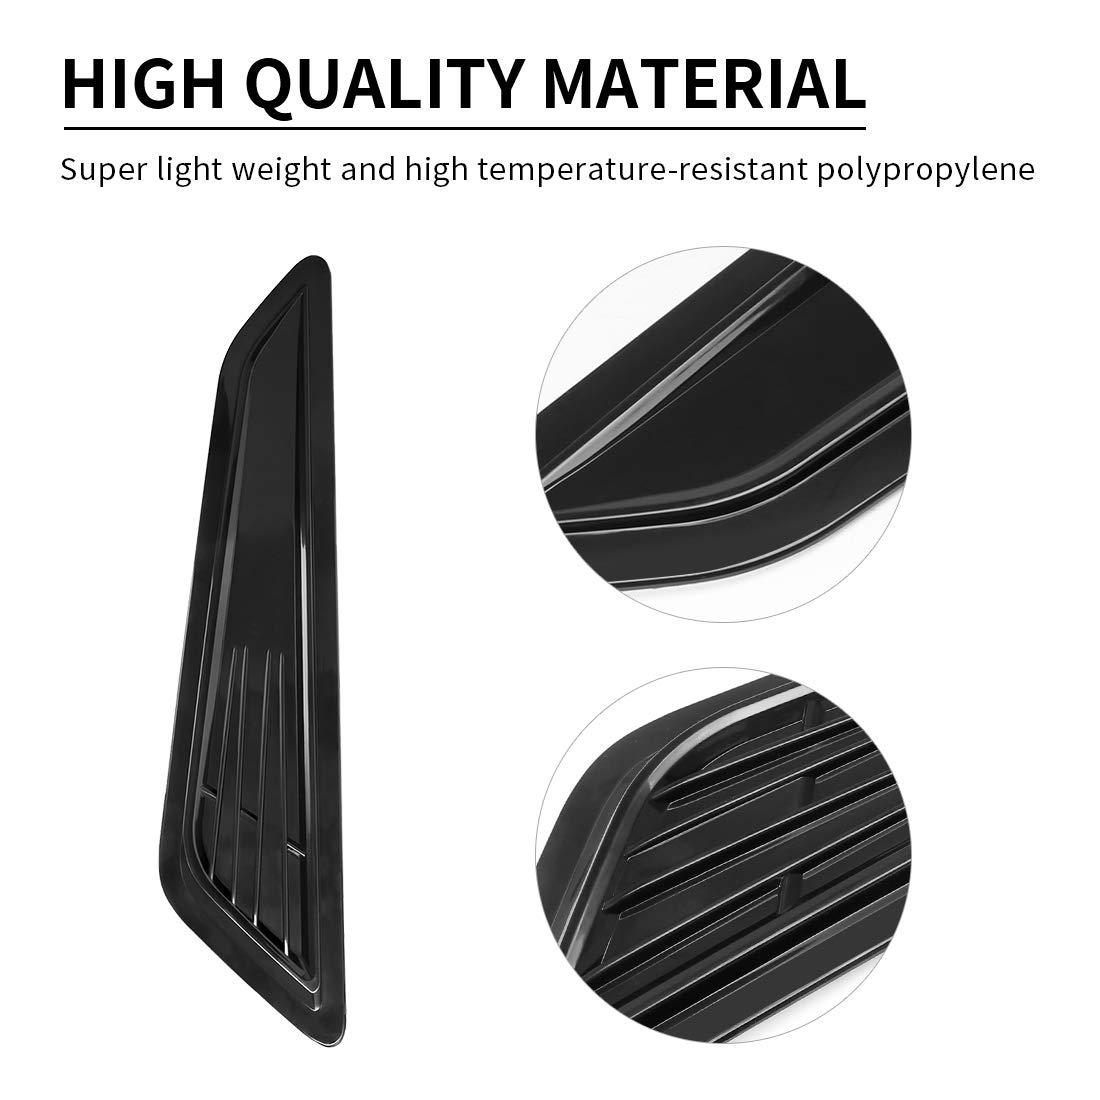 SUPAREE Air Intake Decorative Trim Panel Hood Scoop Bonnet Vent Decor Covers for 2016-2018 Chevy Camaro 1LT// LS//RS-2Pcs